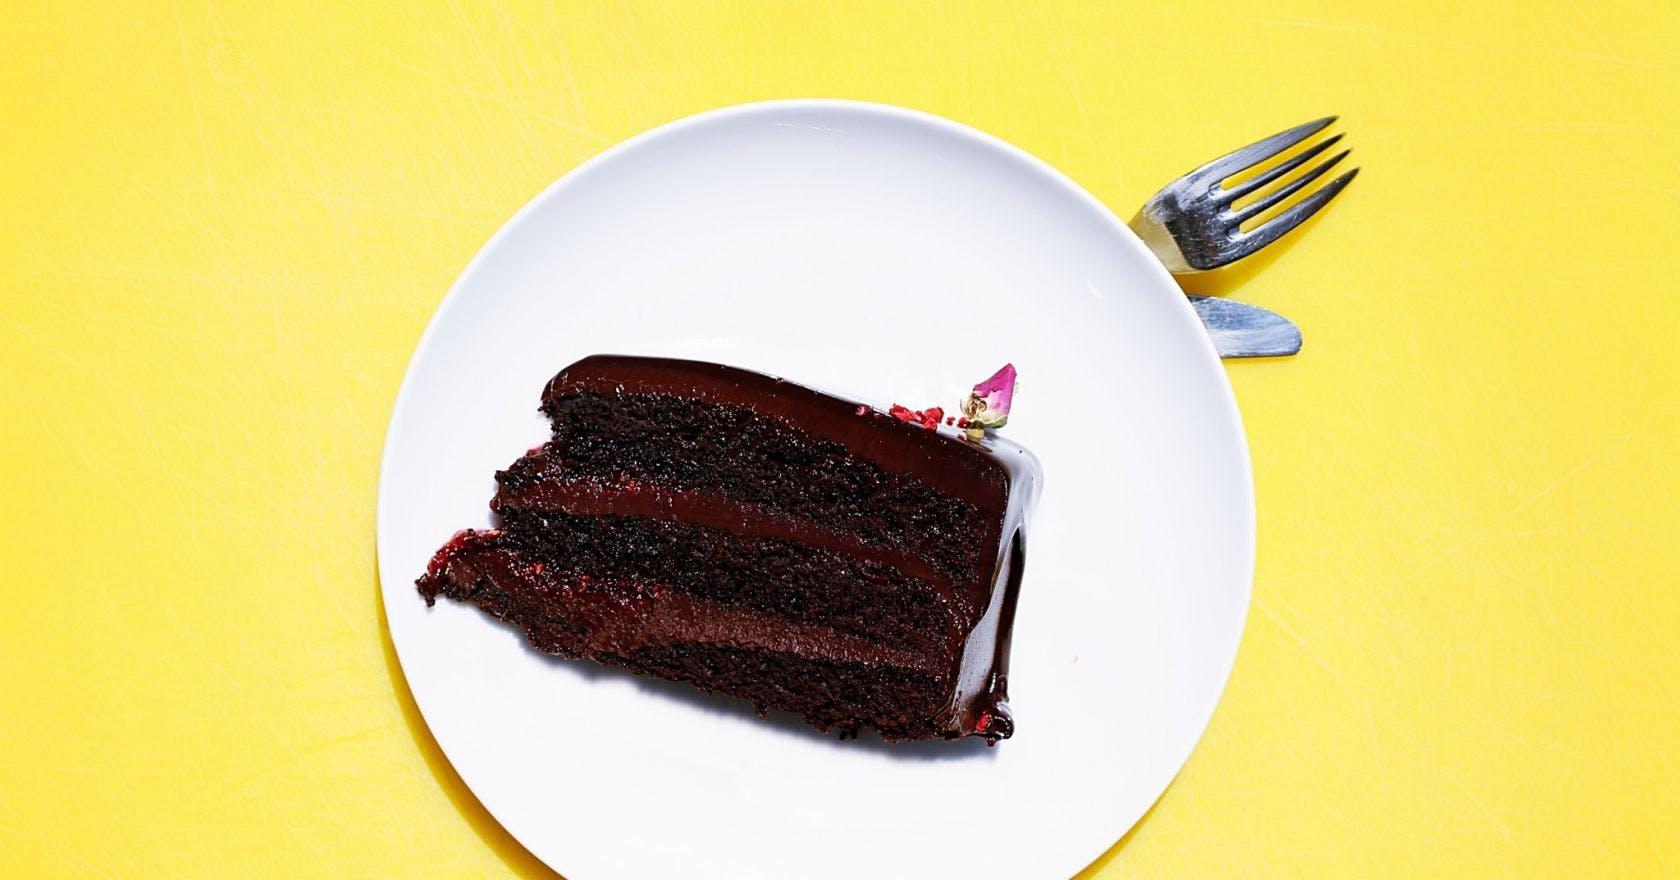 Recipe: How to make the chocolate cake from Roald Dahl's Matilda